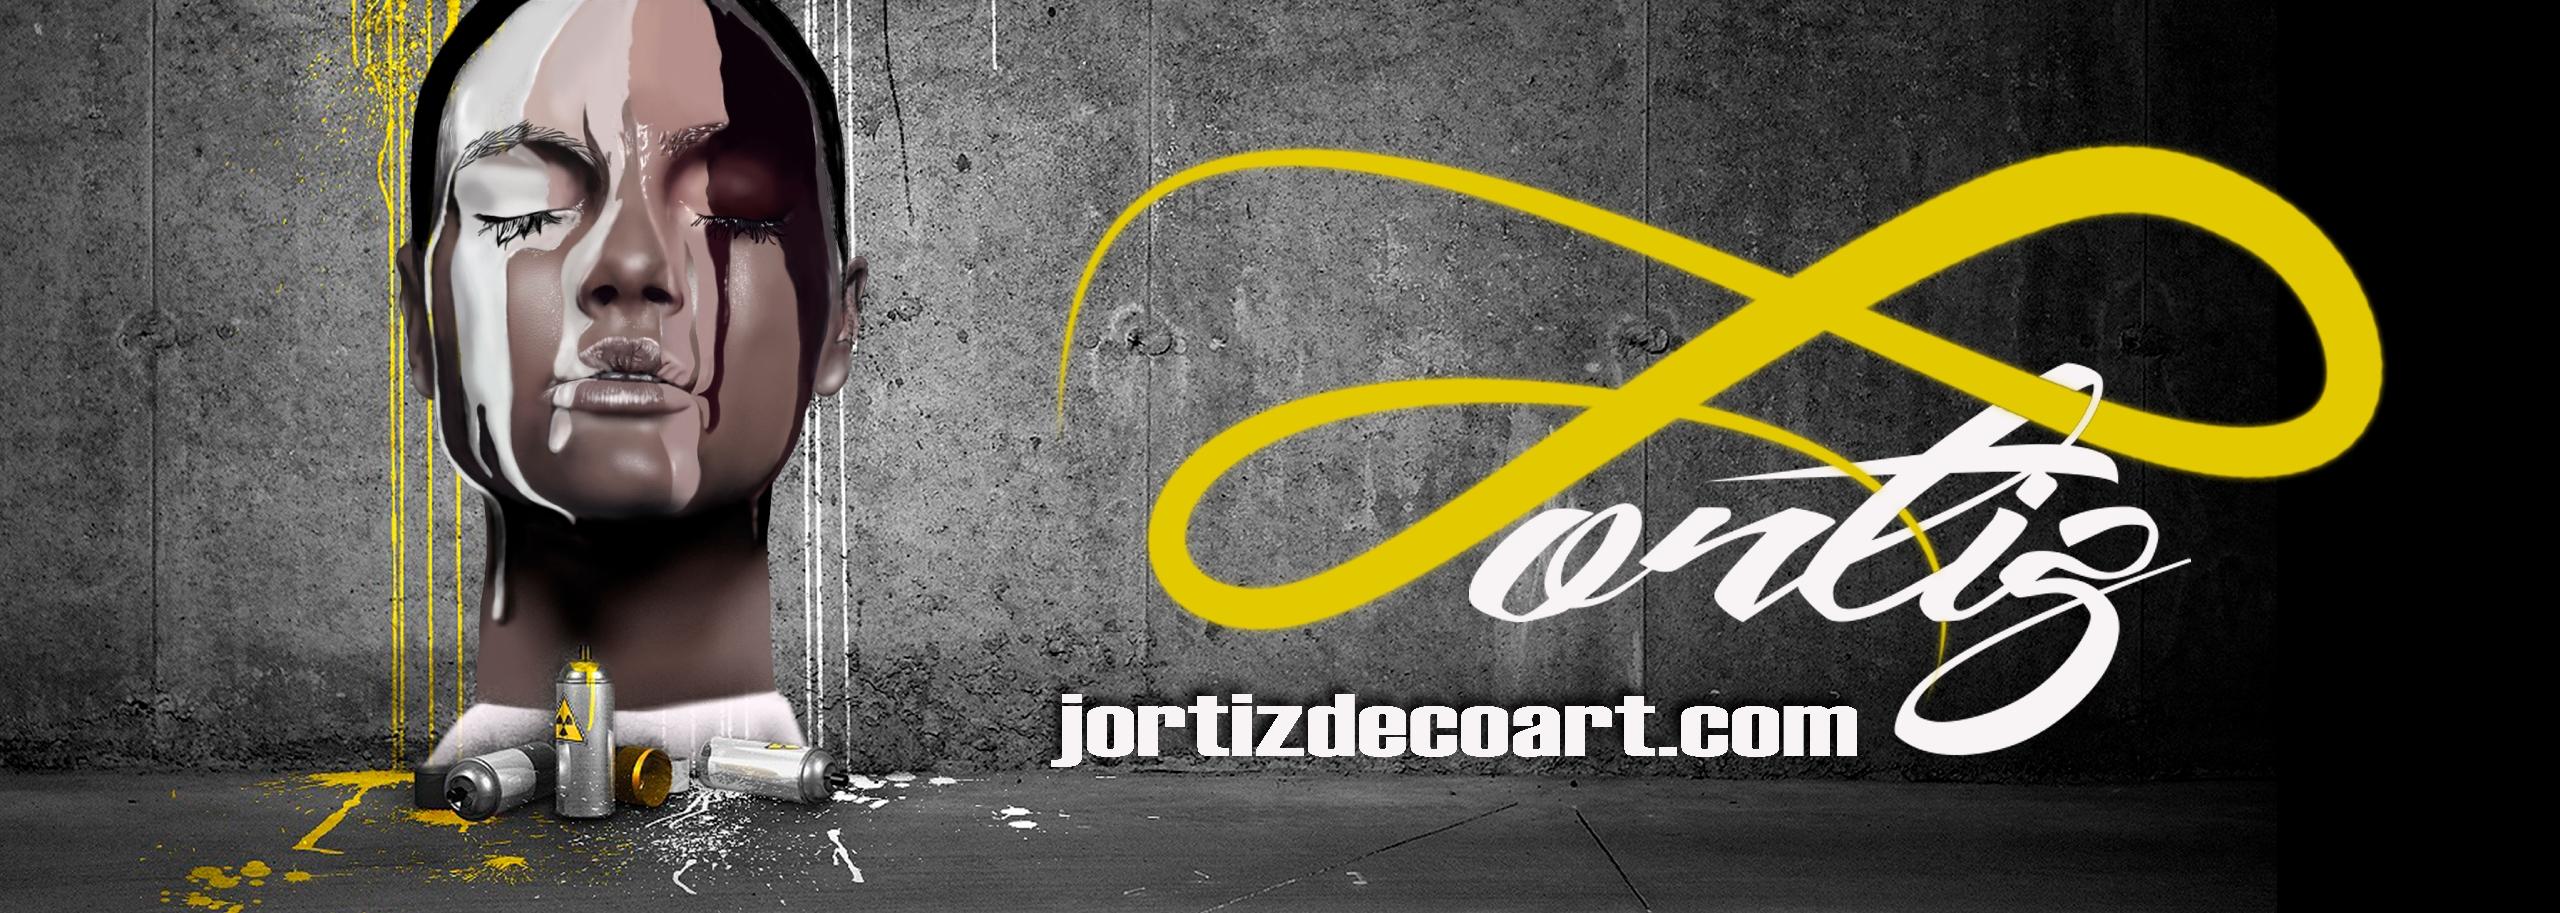 jortiz (@jortizdecoart) Cover Image